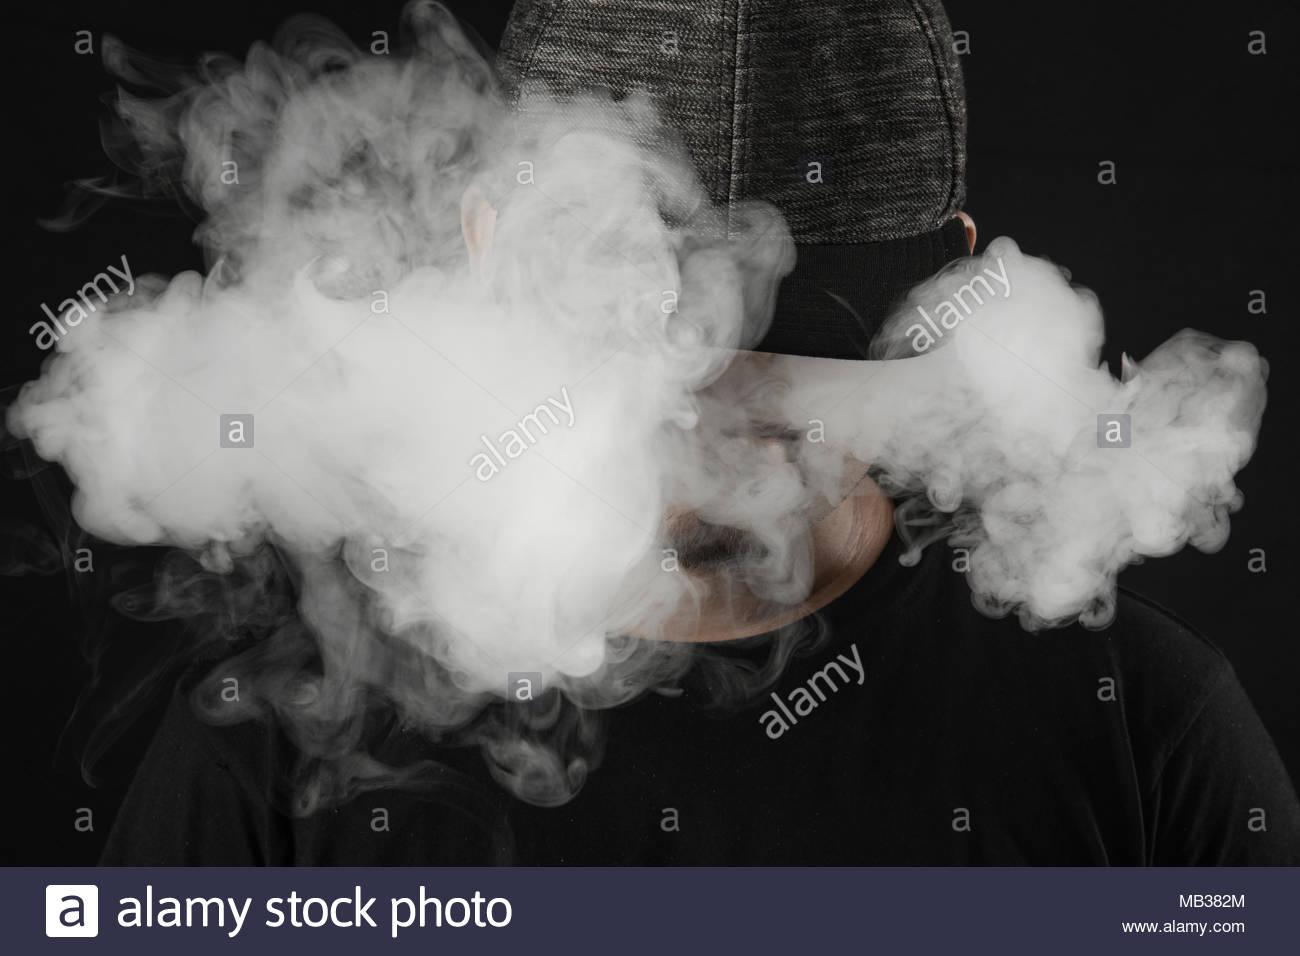 Exhaling smoke/cloud from vaping. - Stock Image